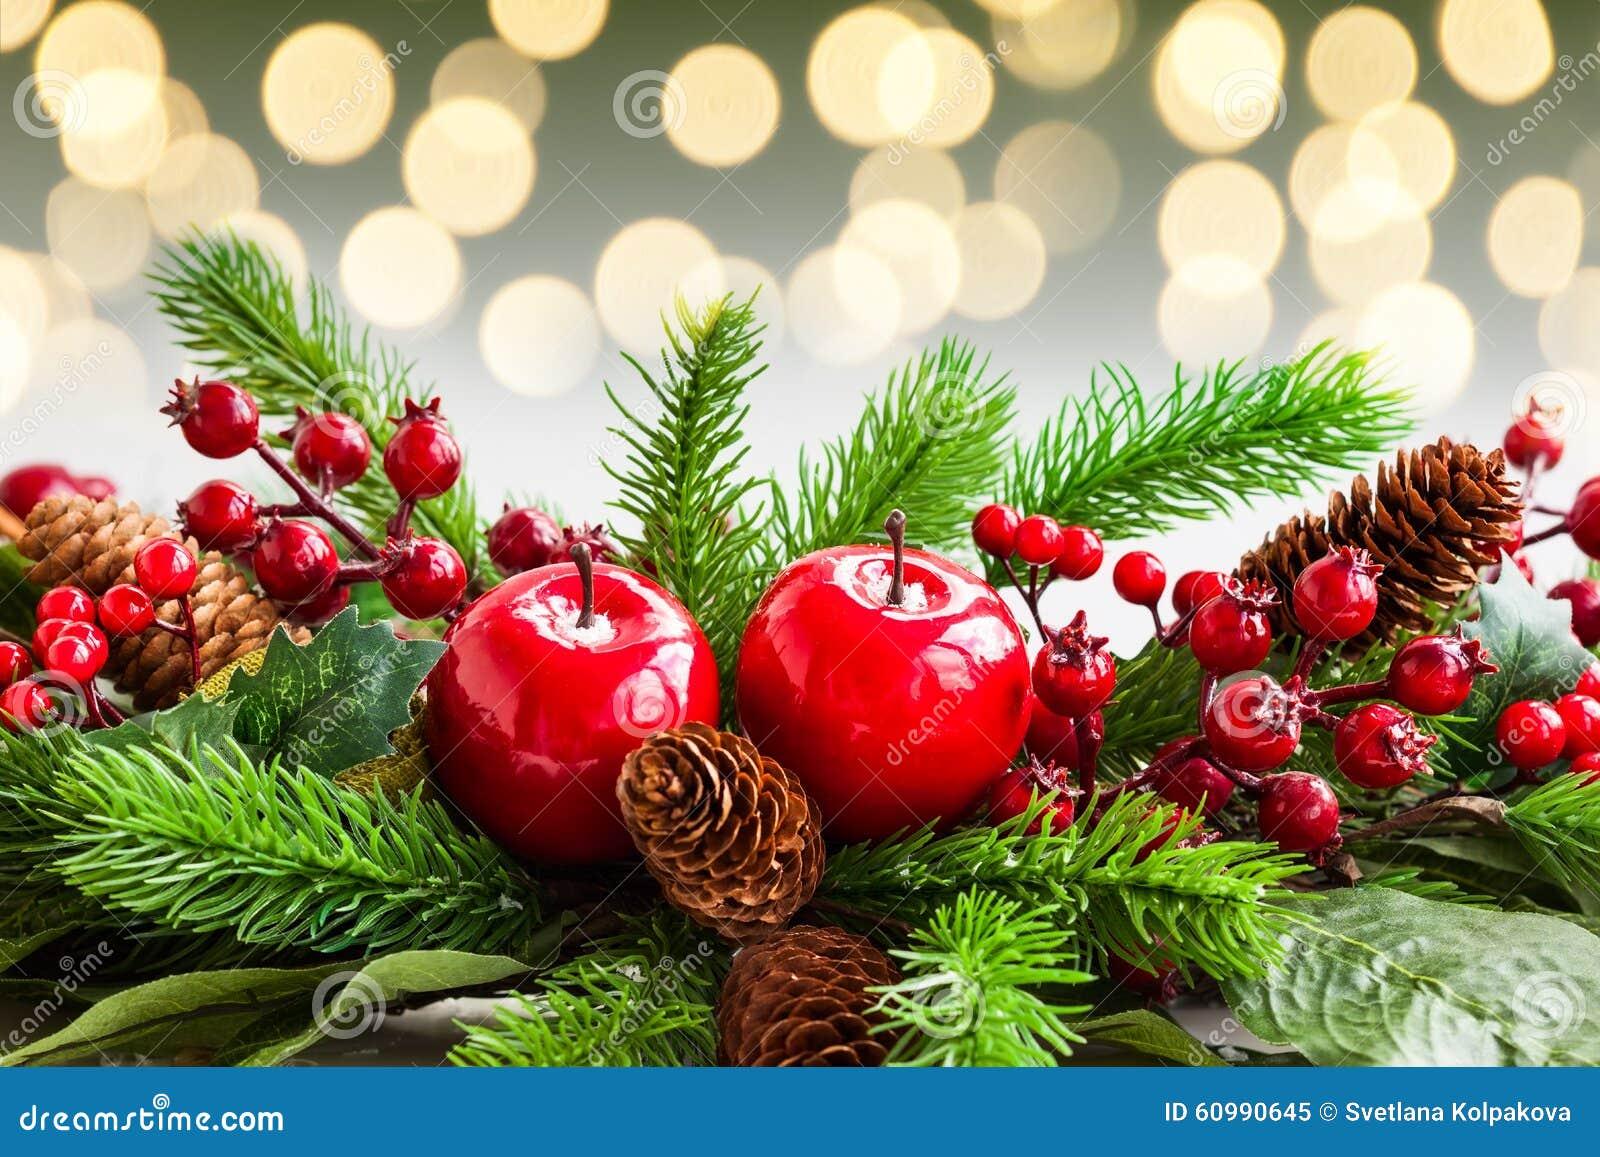 Christmas Decorations Stock Photo Image 60990645